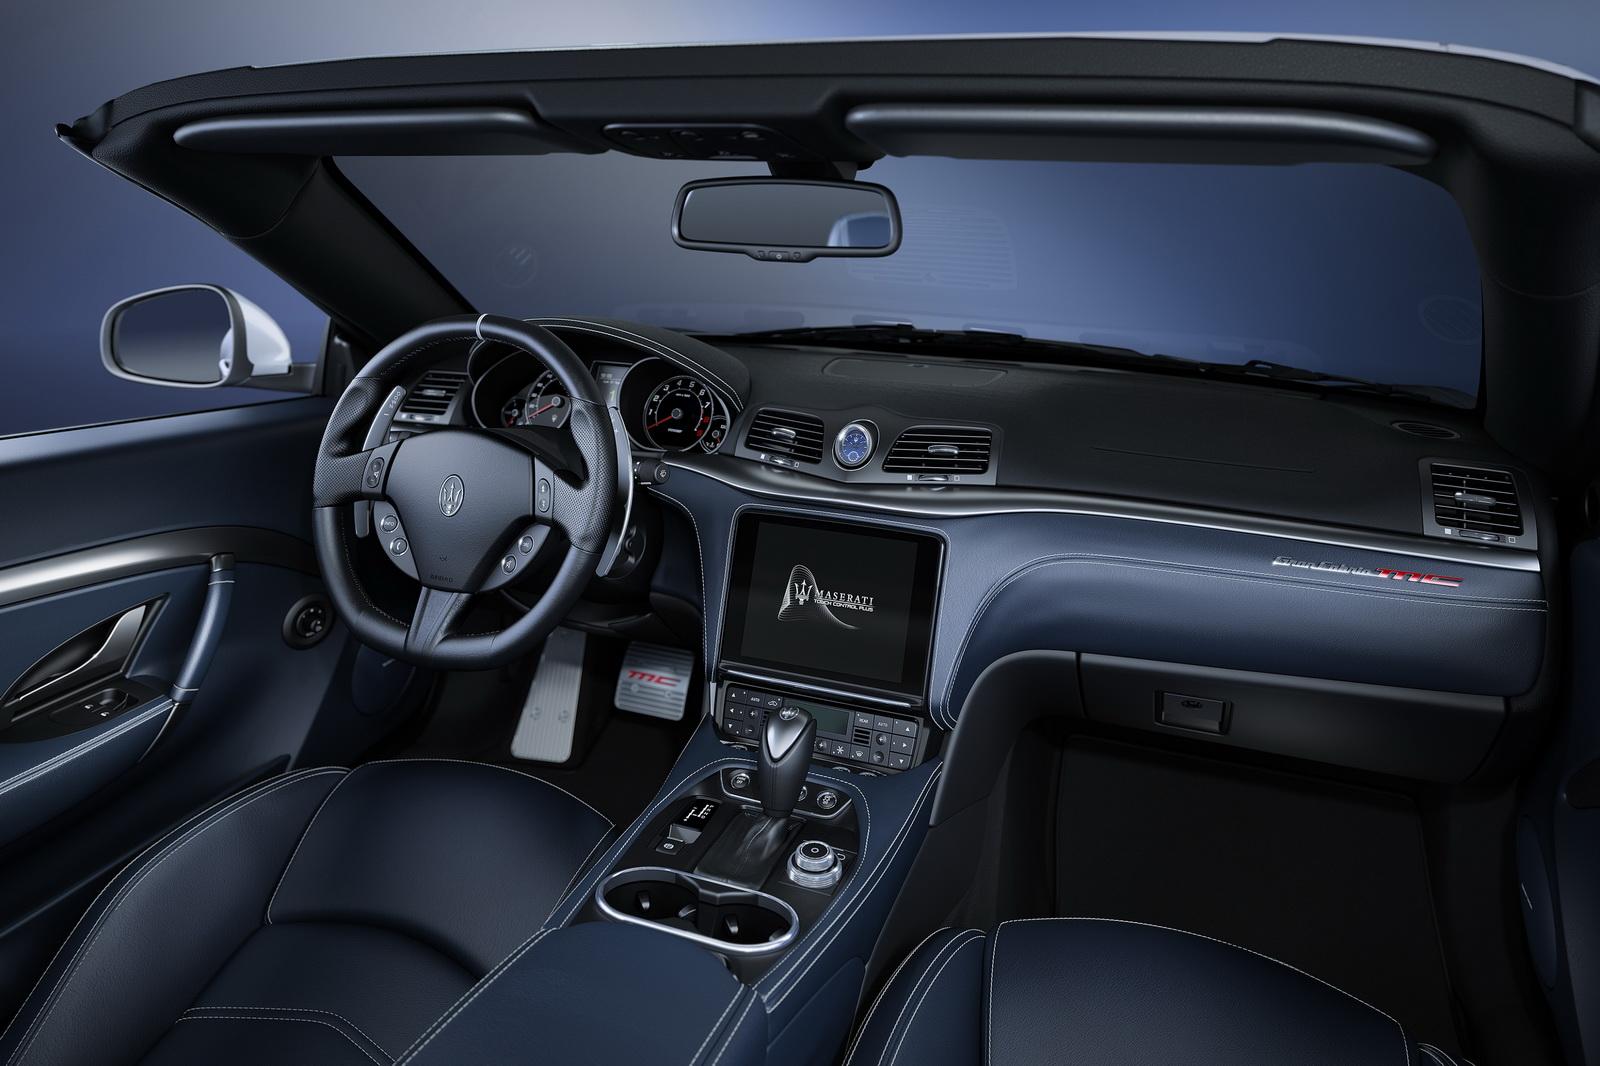 2018 Maserati GranTurismo i GranCabrio [oficjalnie ...